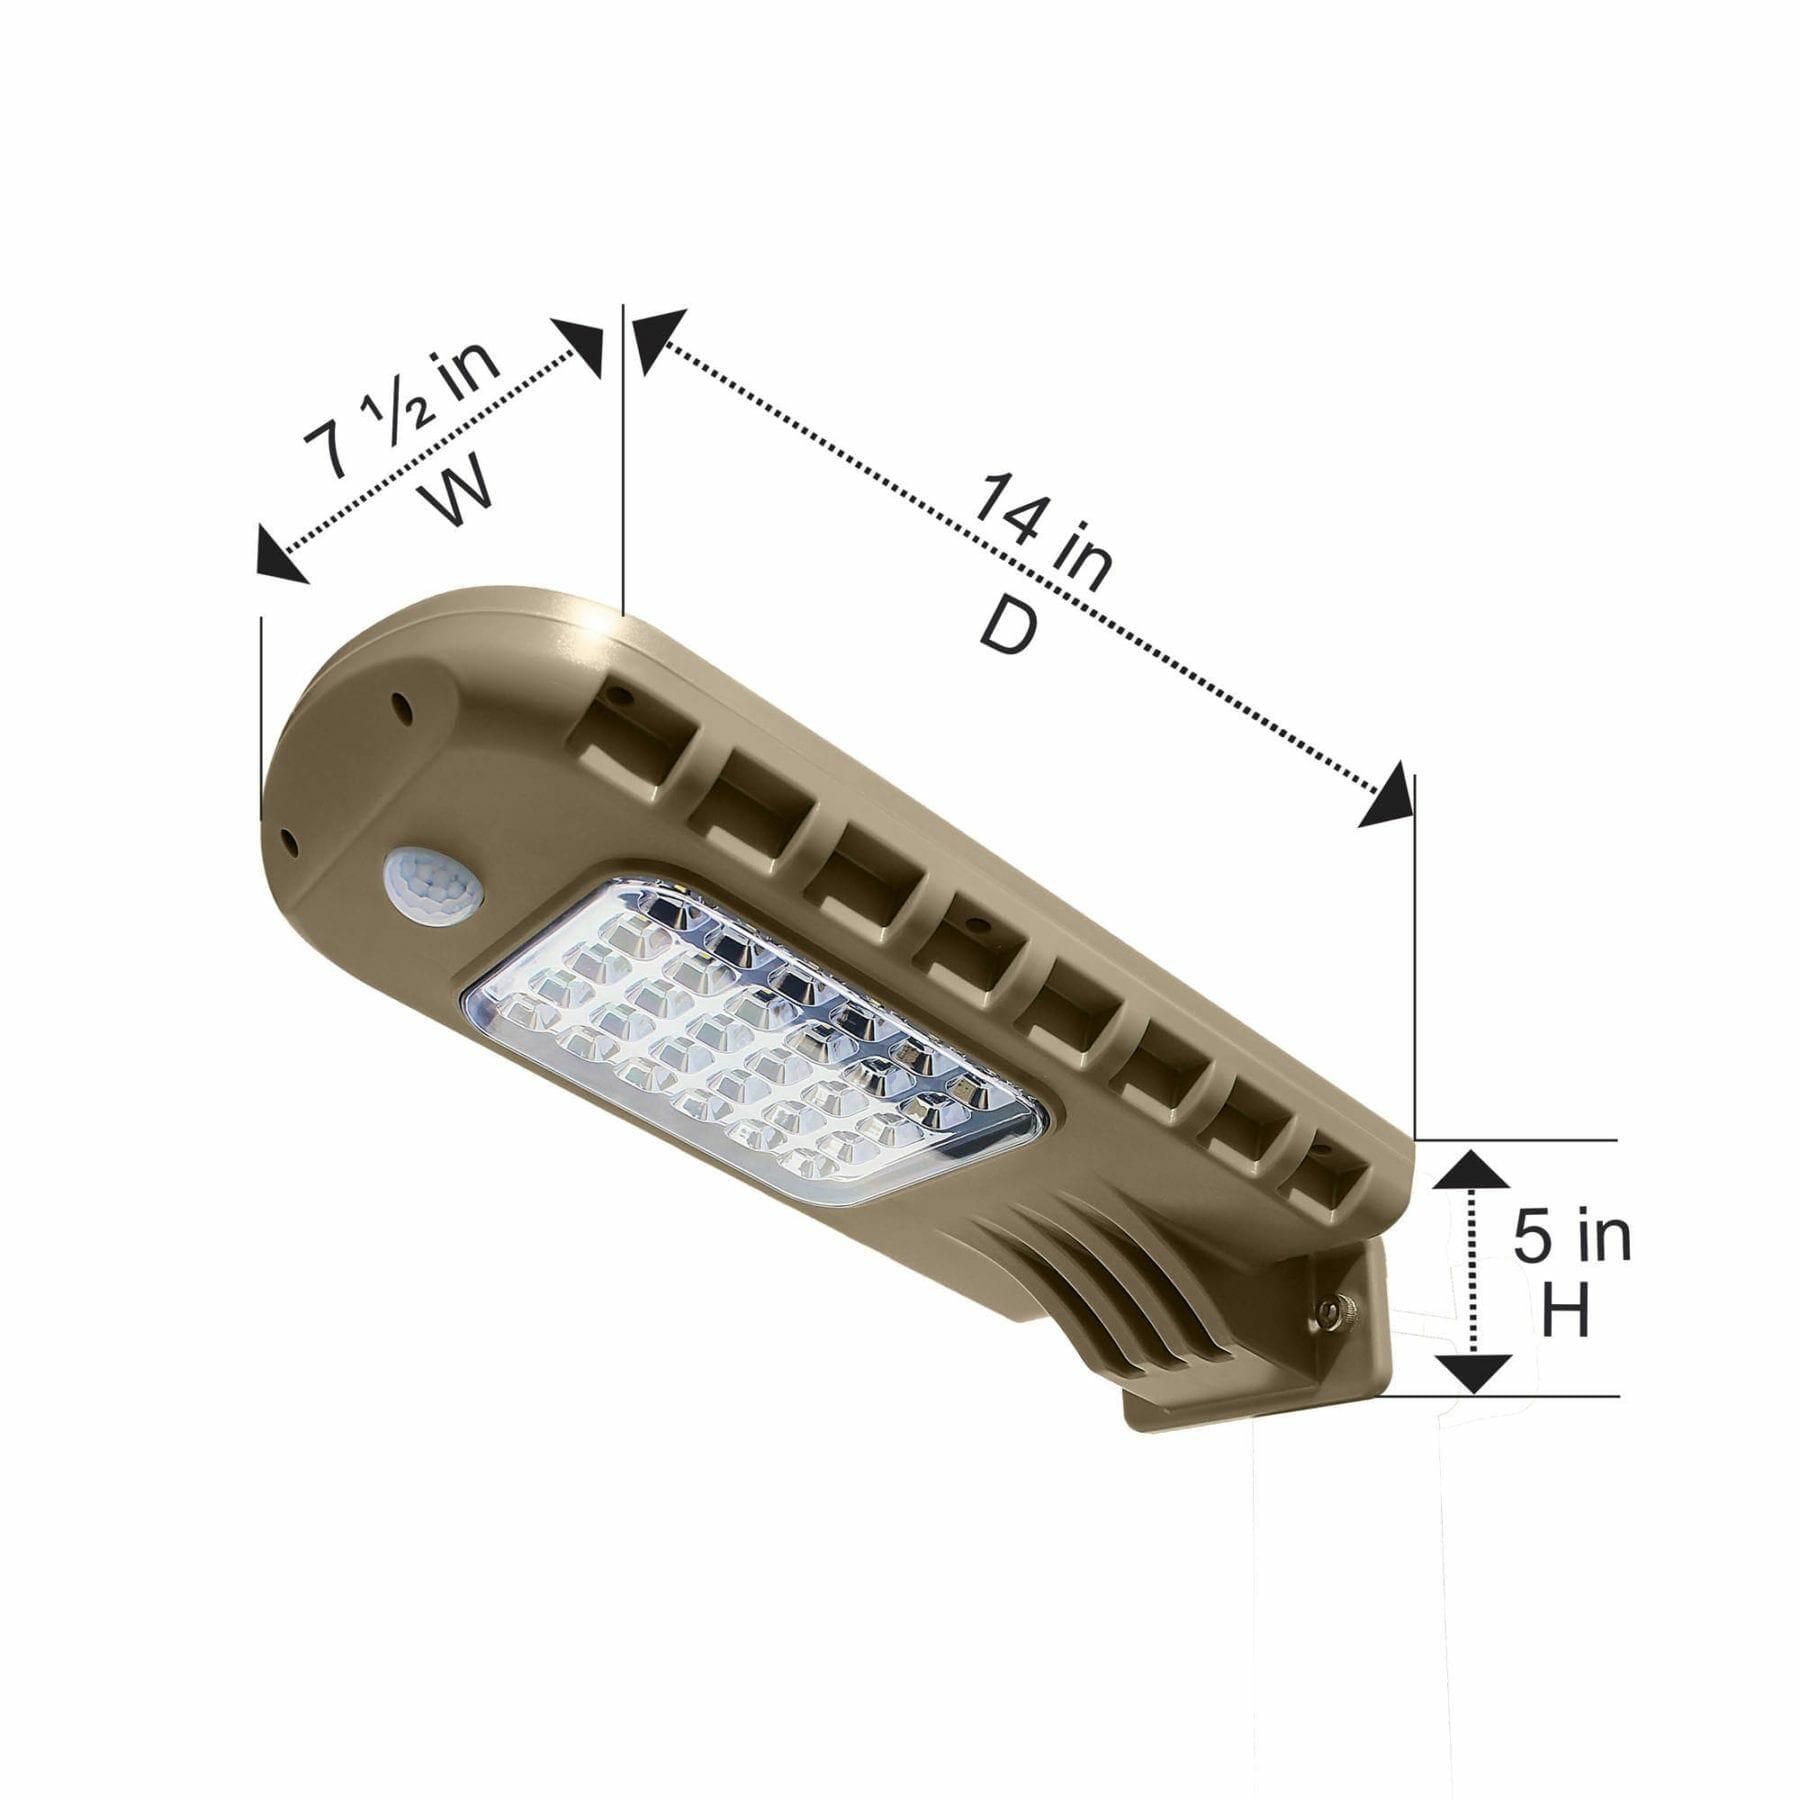 6-Watt Solar Security Light with PIR motion sensor